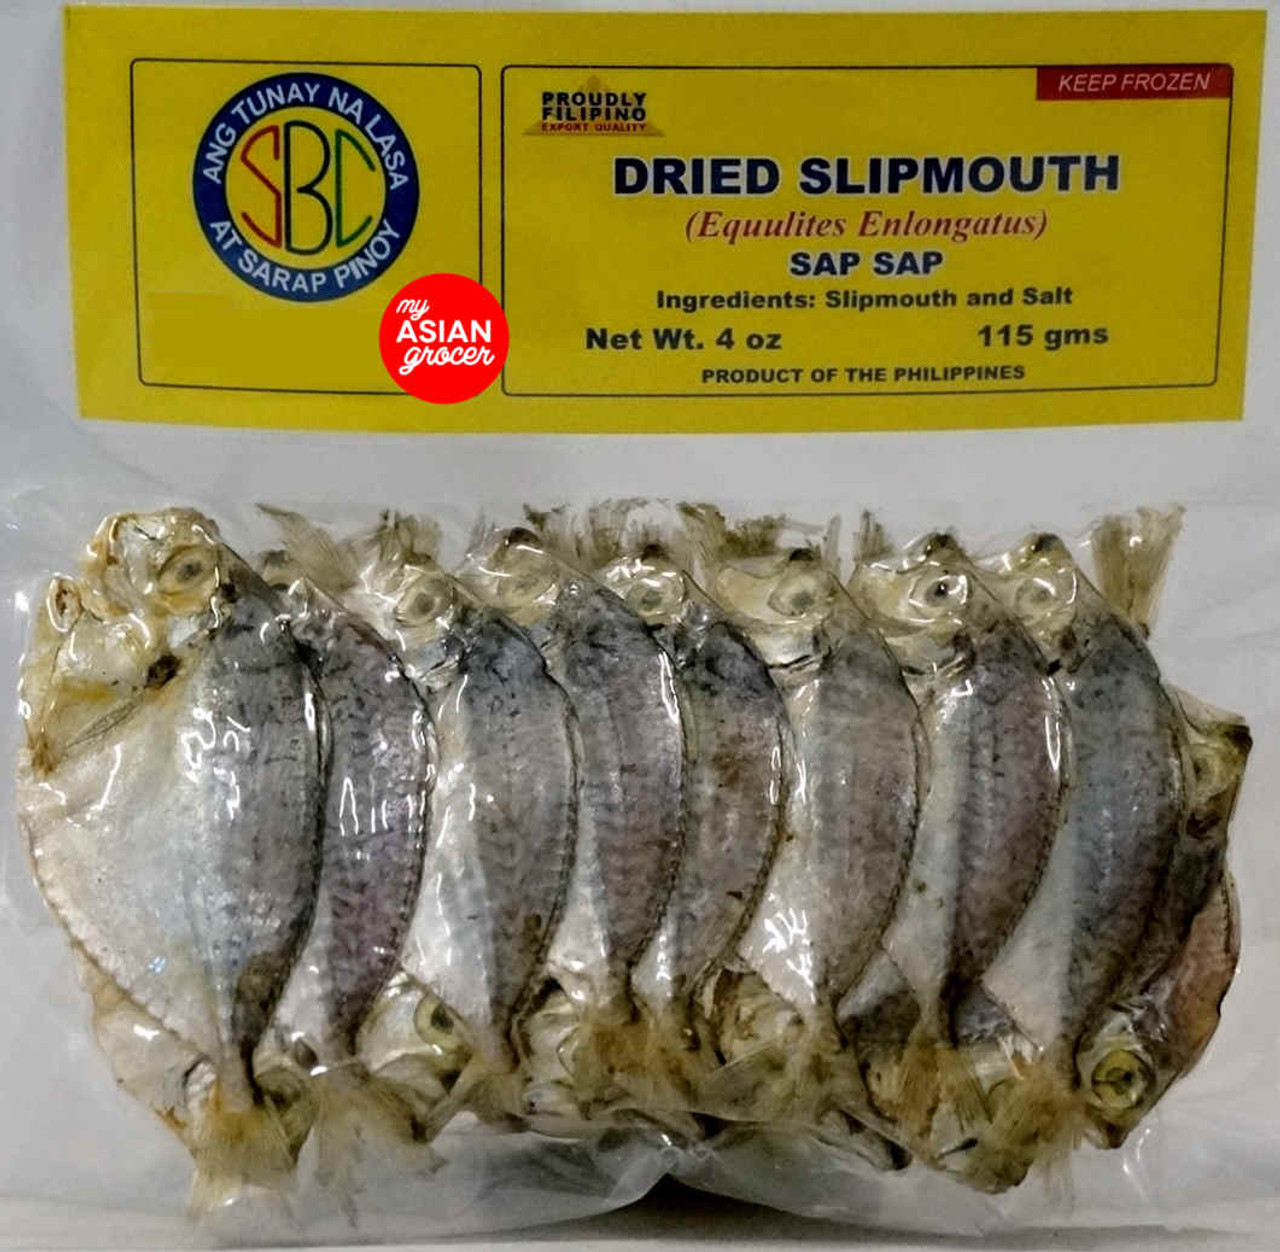 SBC Dried Slipmouth Sap Sap 200g